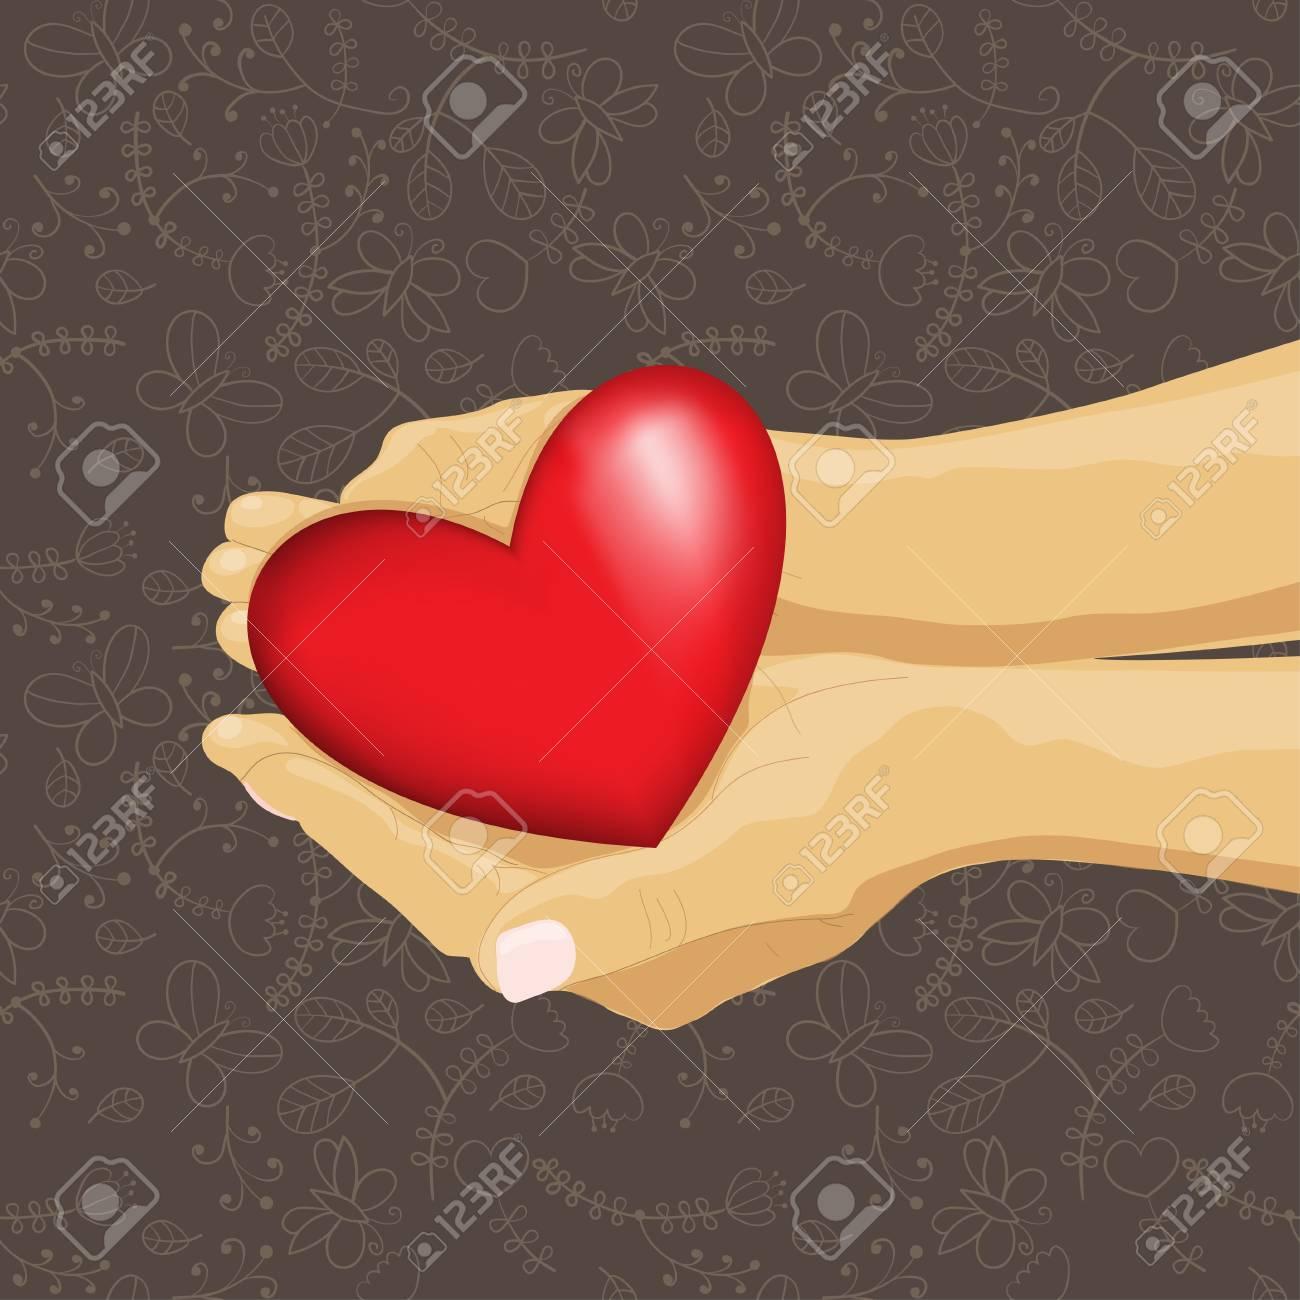 heart in hand, illustration on seamless pattern Stock Vector - 17414076